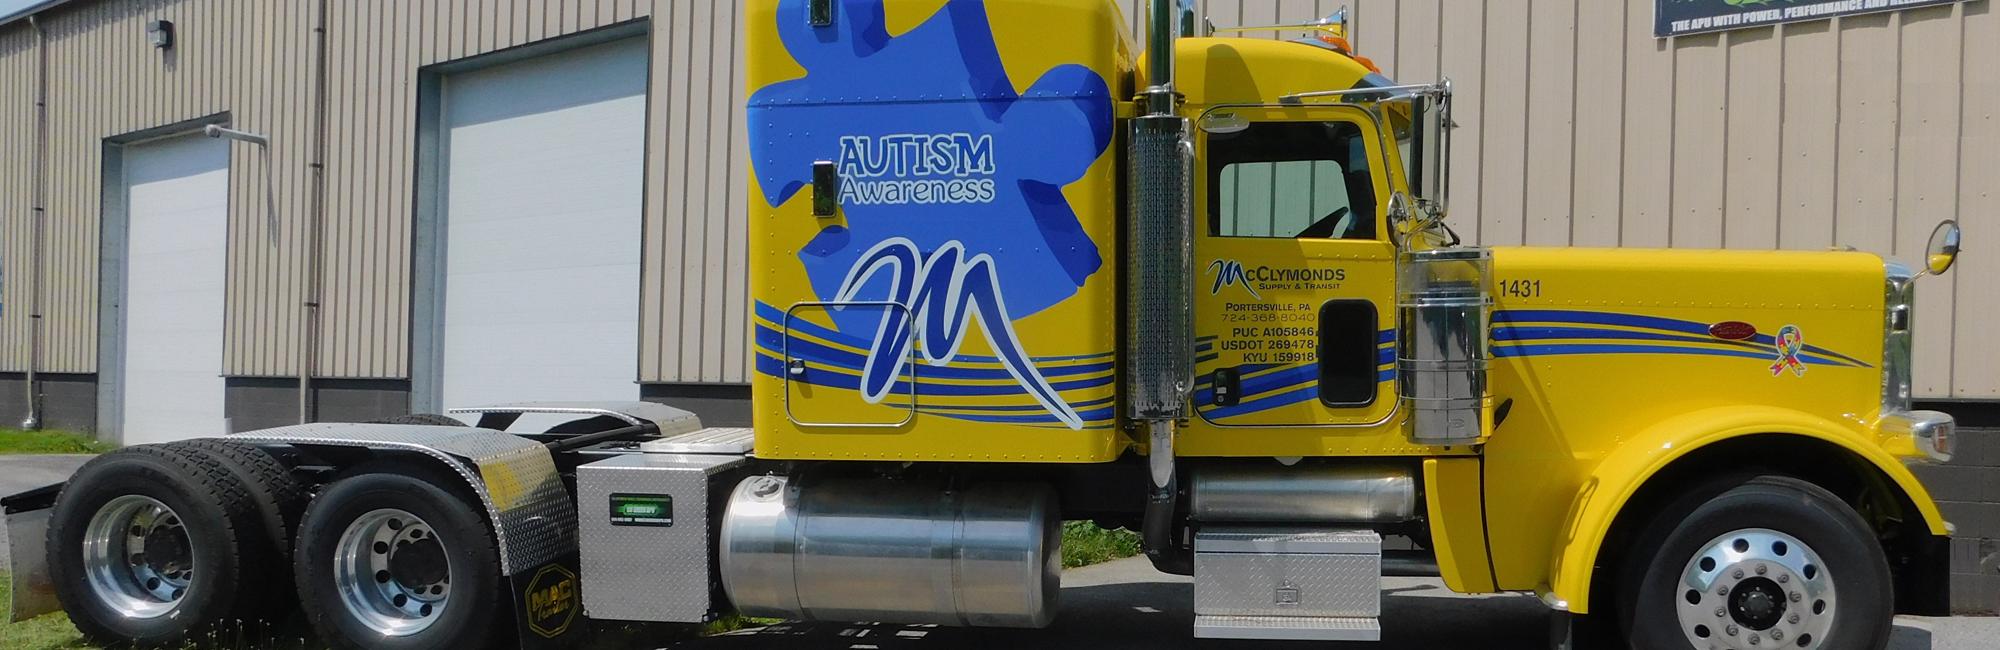 Autism_Slide_C